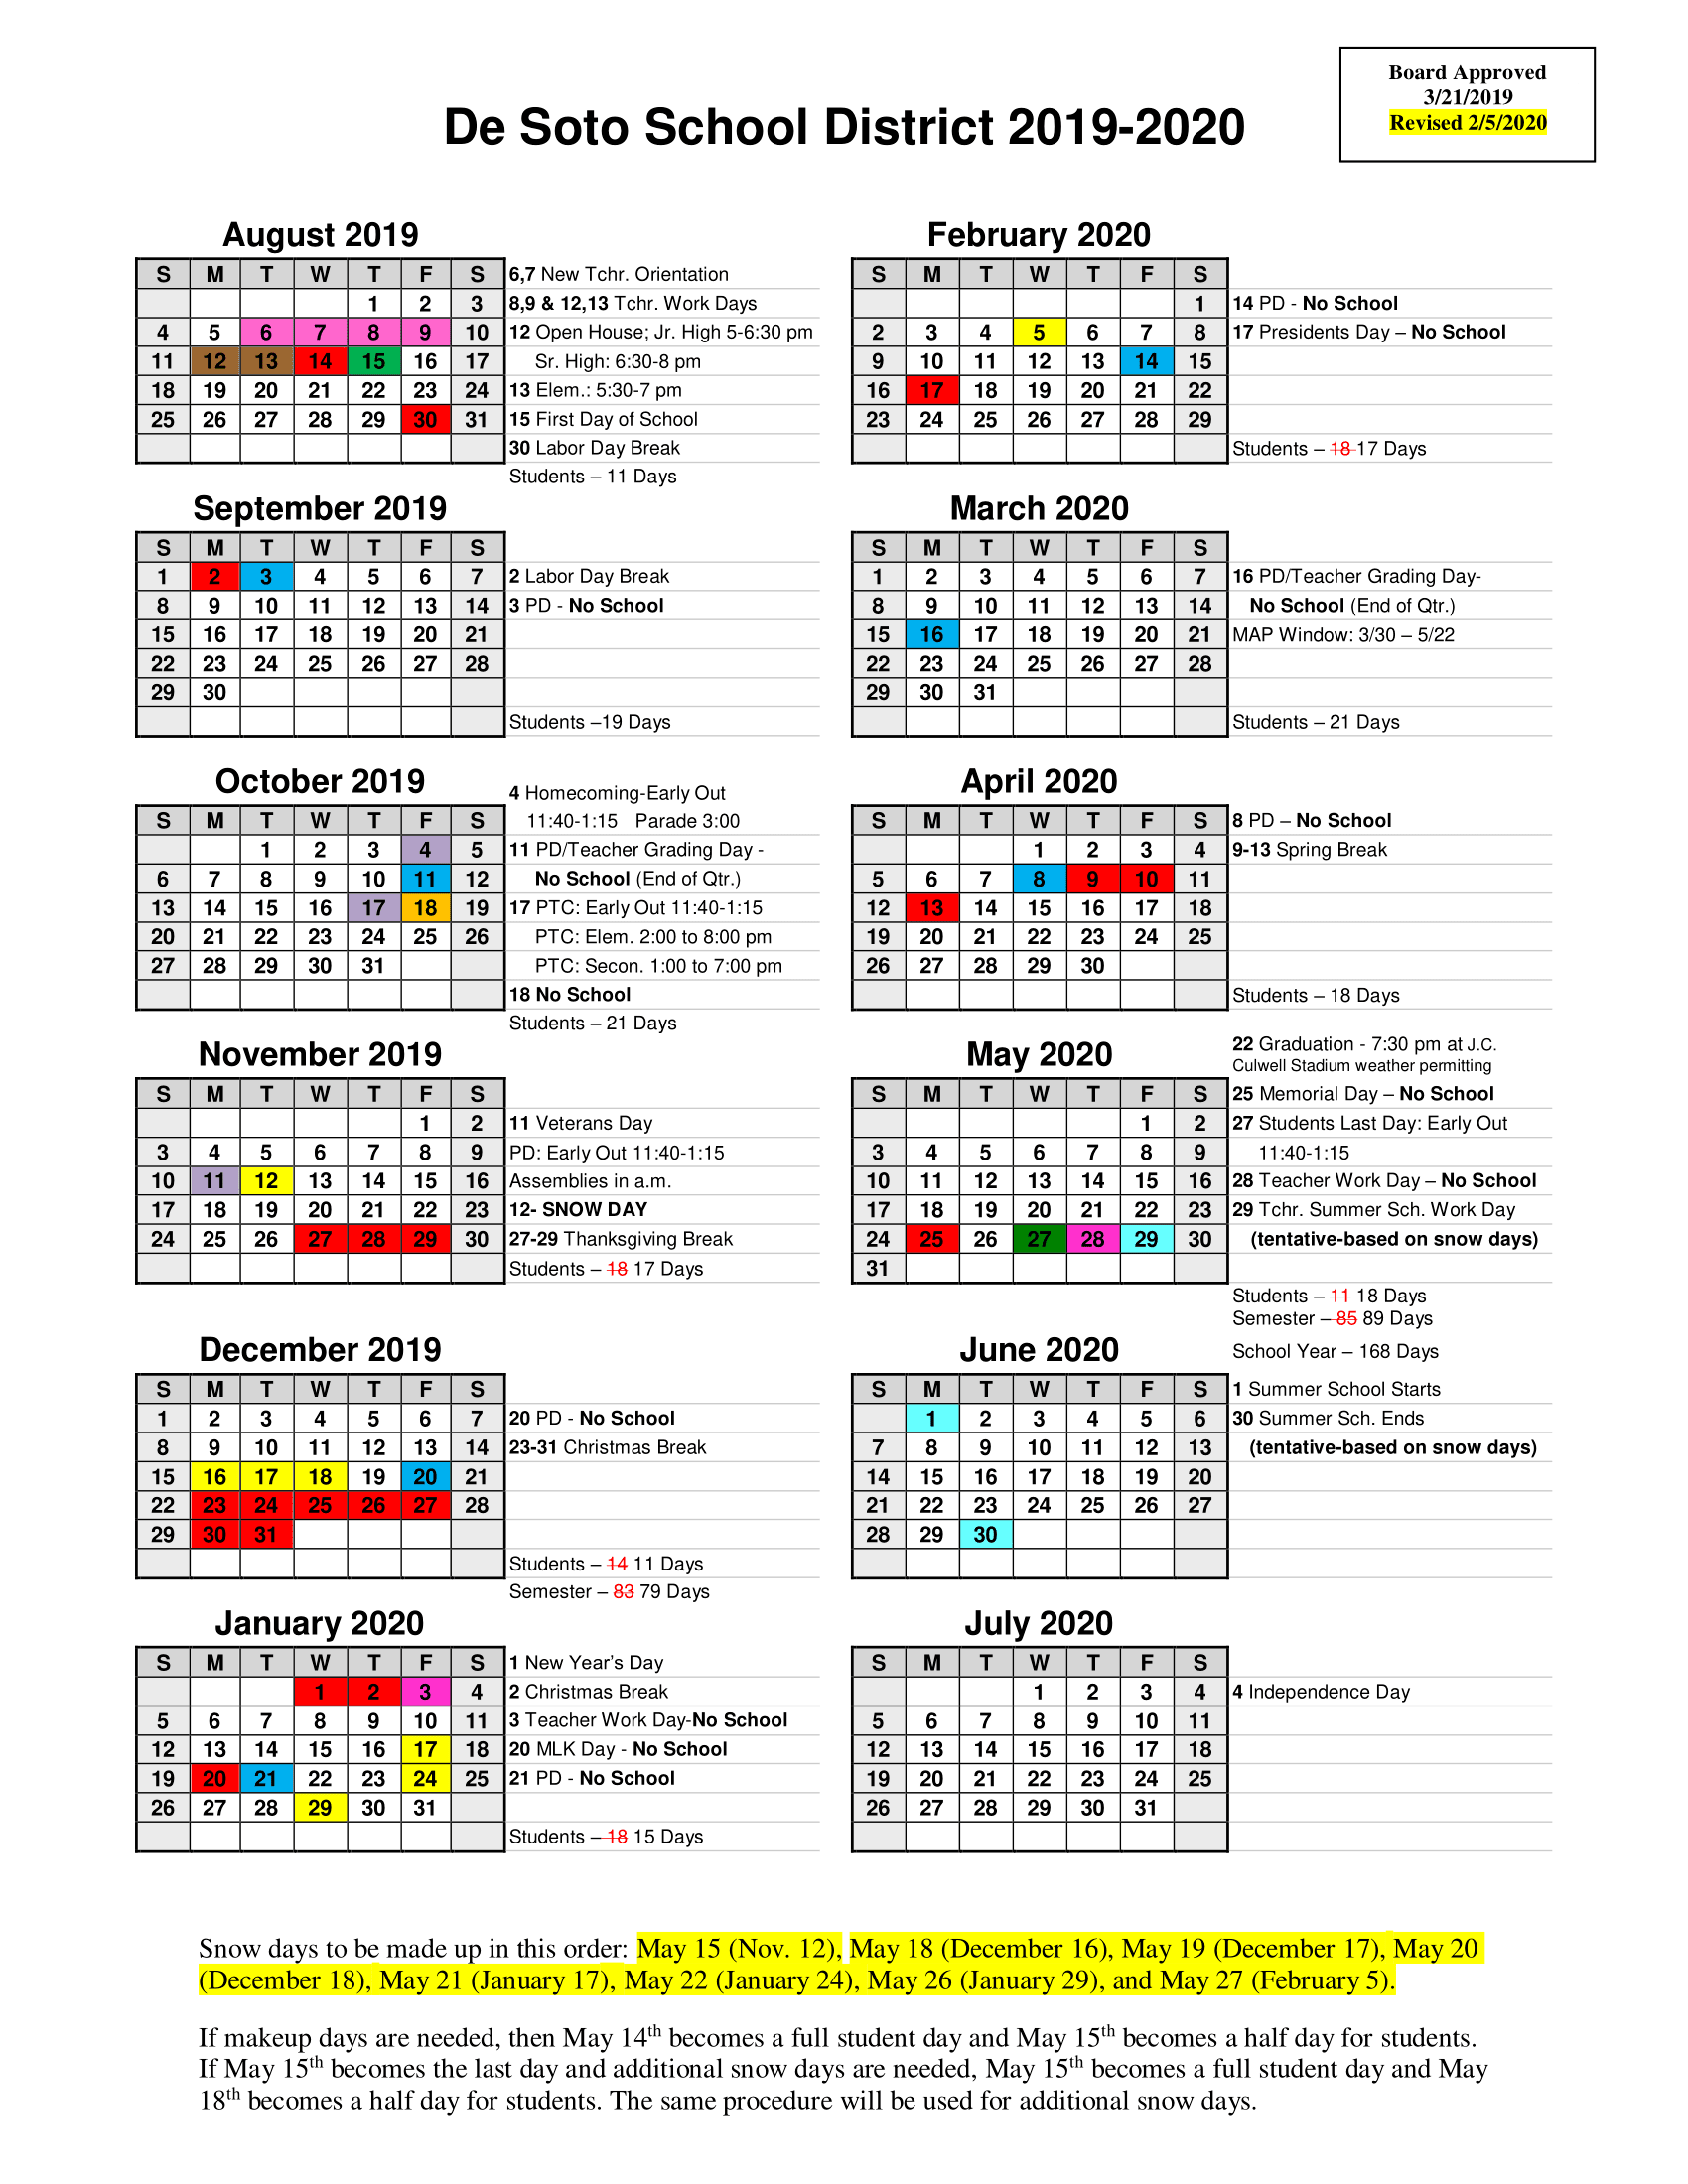 Revised 2019 2020 School Calendar – De Soto Public School For Webster Groves School District Calendar